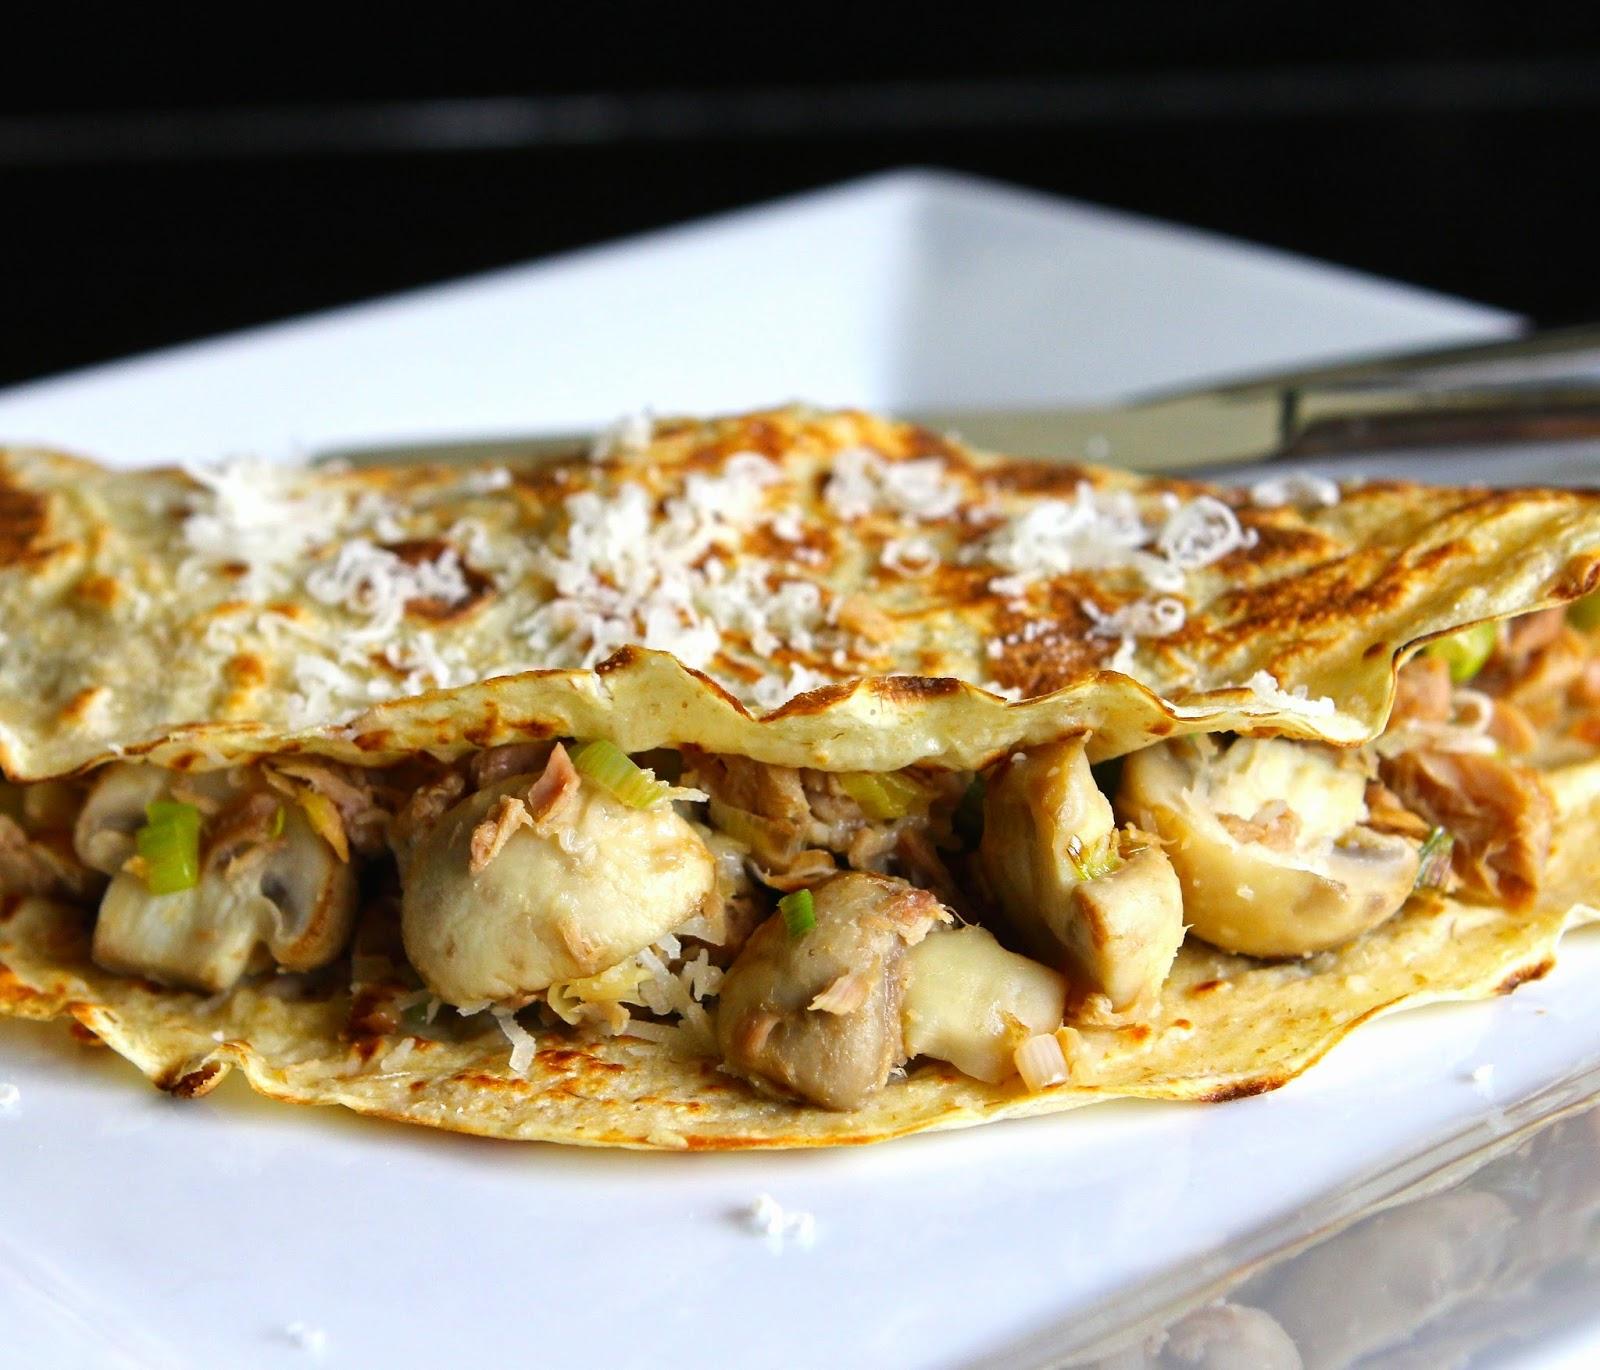 Gluten Free Alchemist: Oat Pancakes - healthy, delicious & gluten free